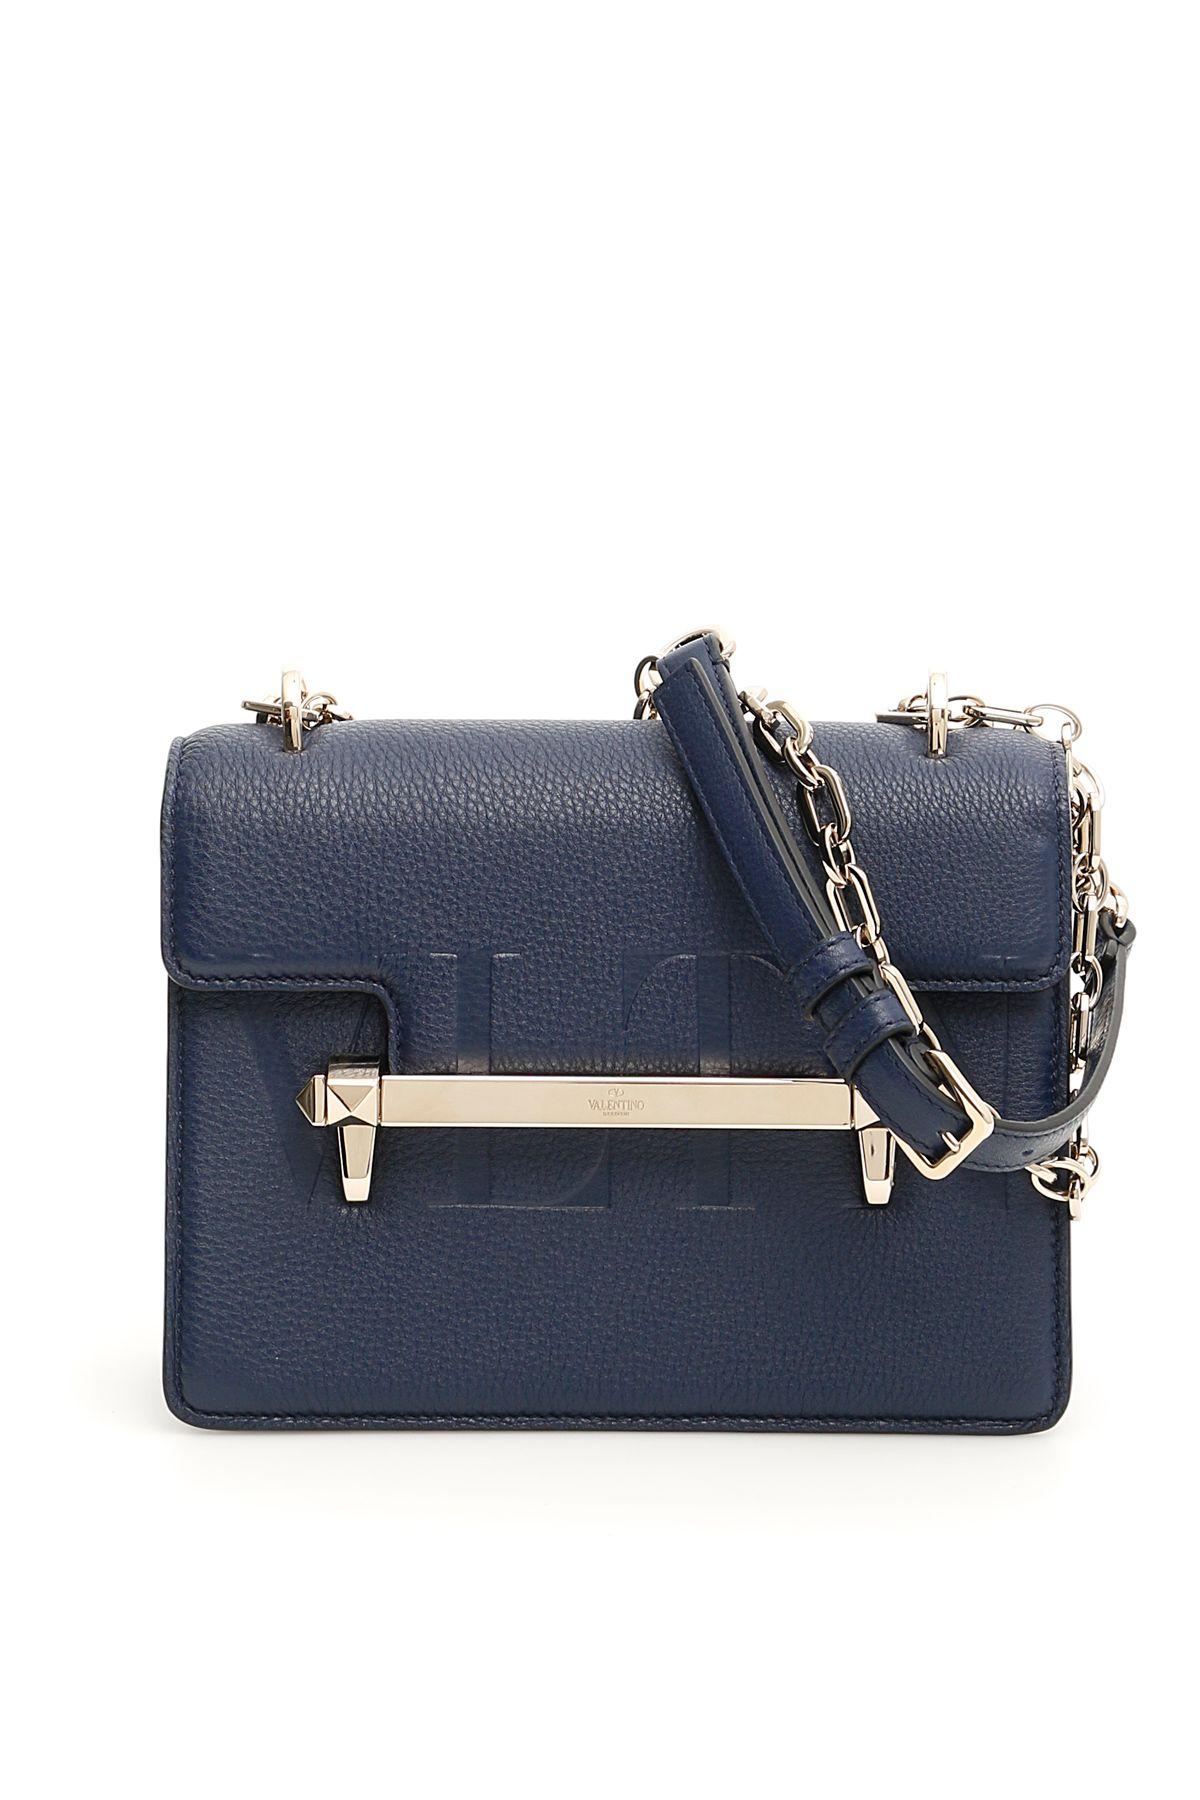 Valentino Vltn Uptown Bag